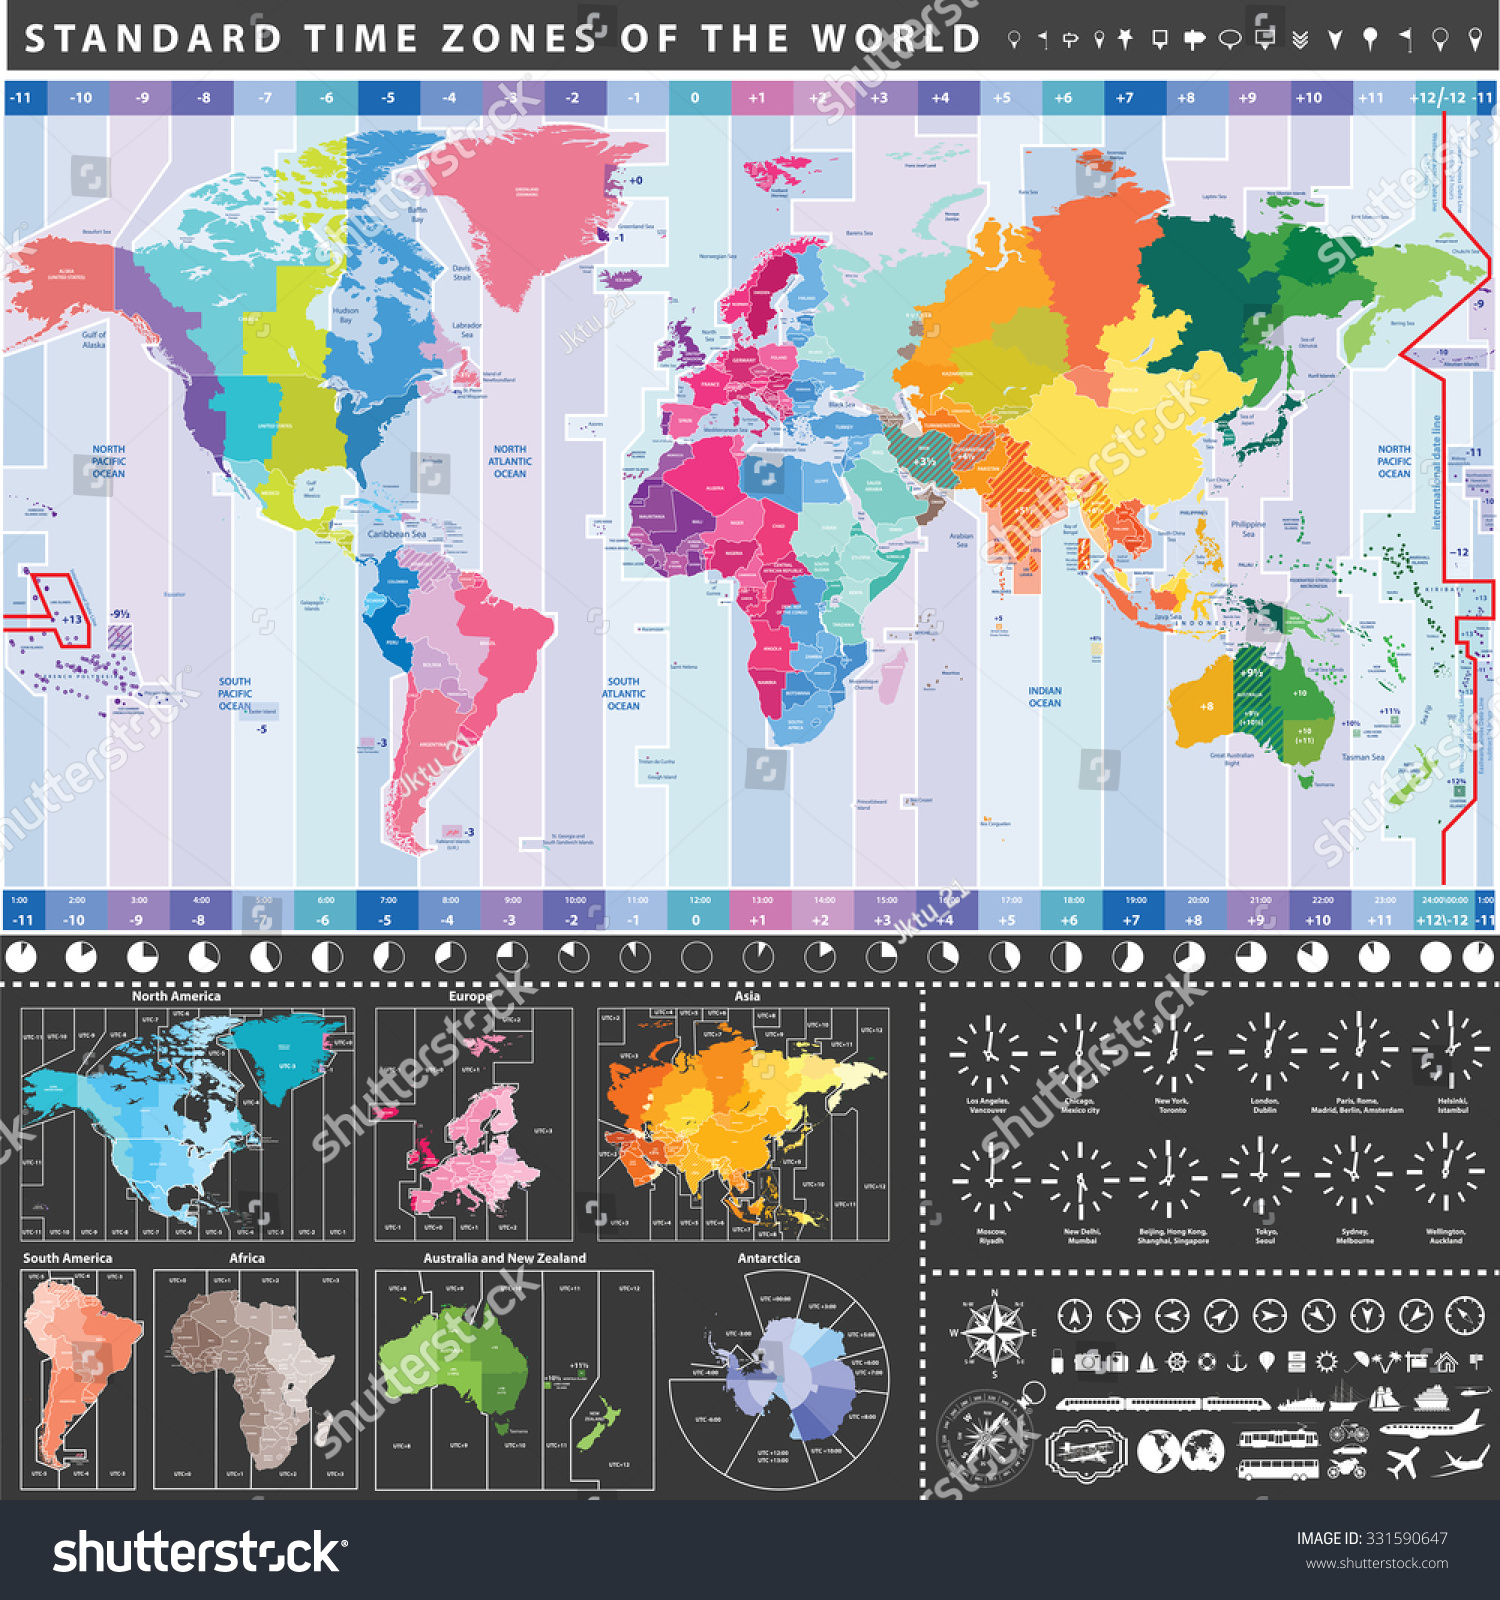 Vector world standard time zones map vectores en stock 331590647 vector world standard time zones map vectores en stock 331590647 shutterstock gumiabroncs Images